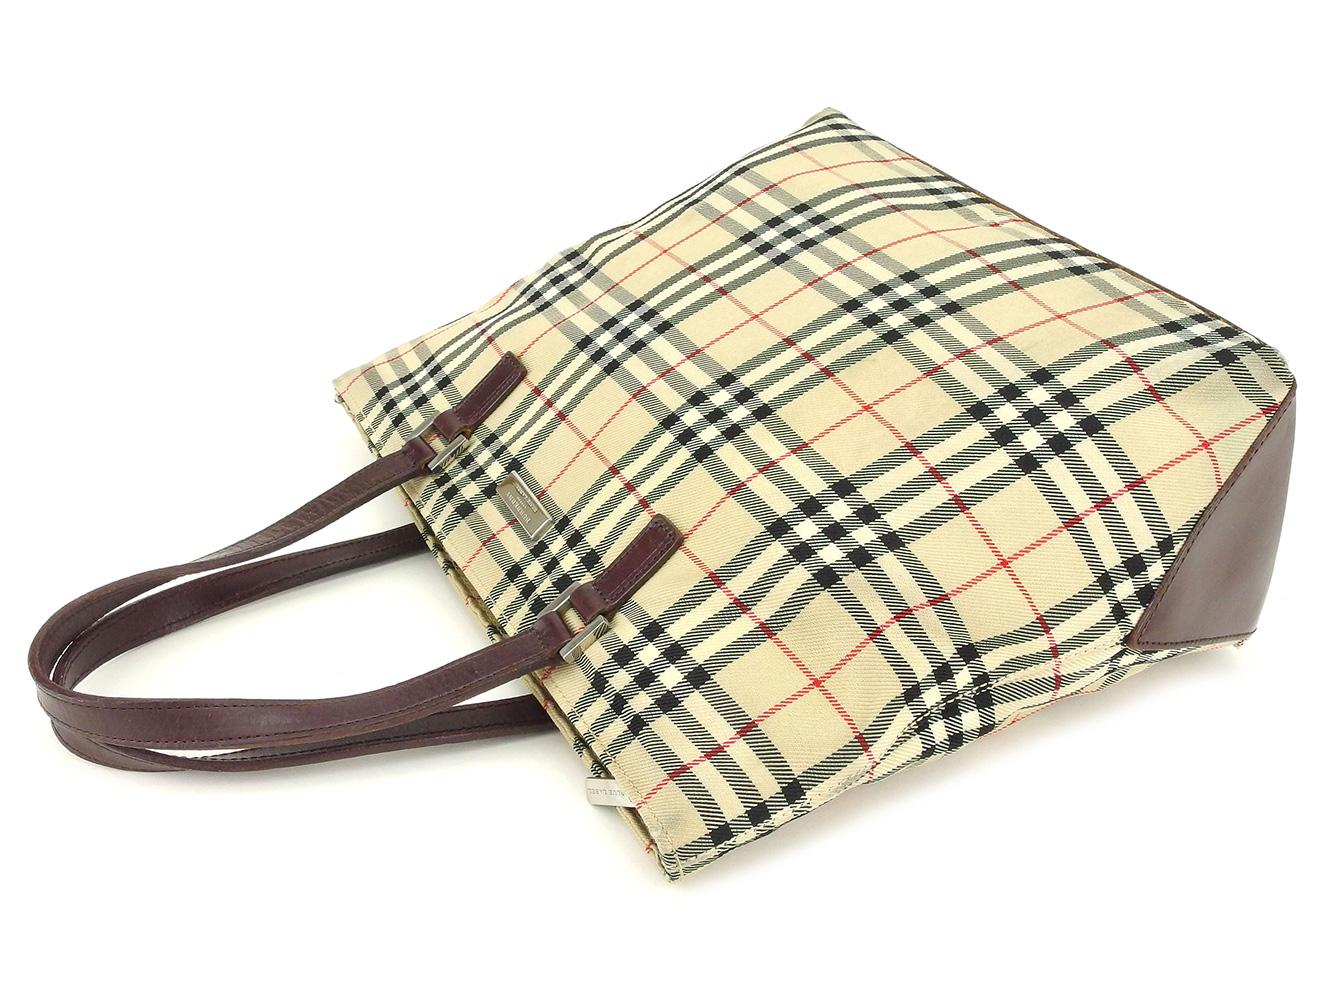 Burberry BURBERRY tote bag handbag Lady s Novacek beige canvas X leather  popularity sale S984 6119496e30a88